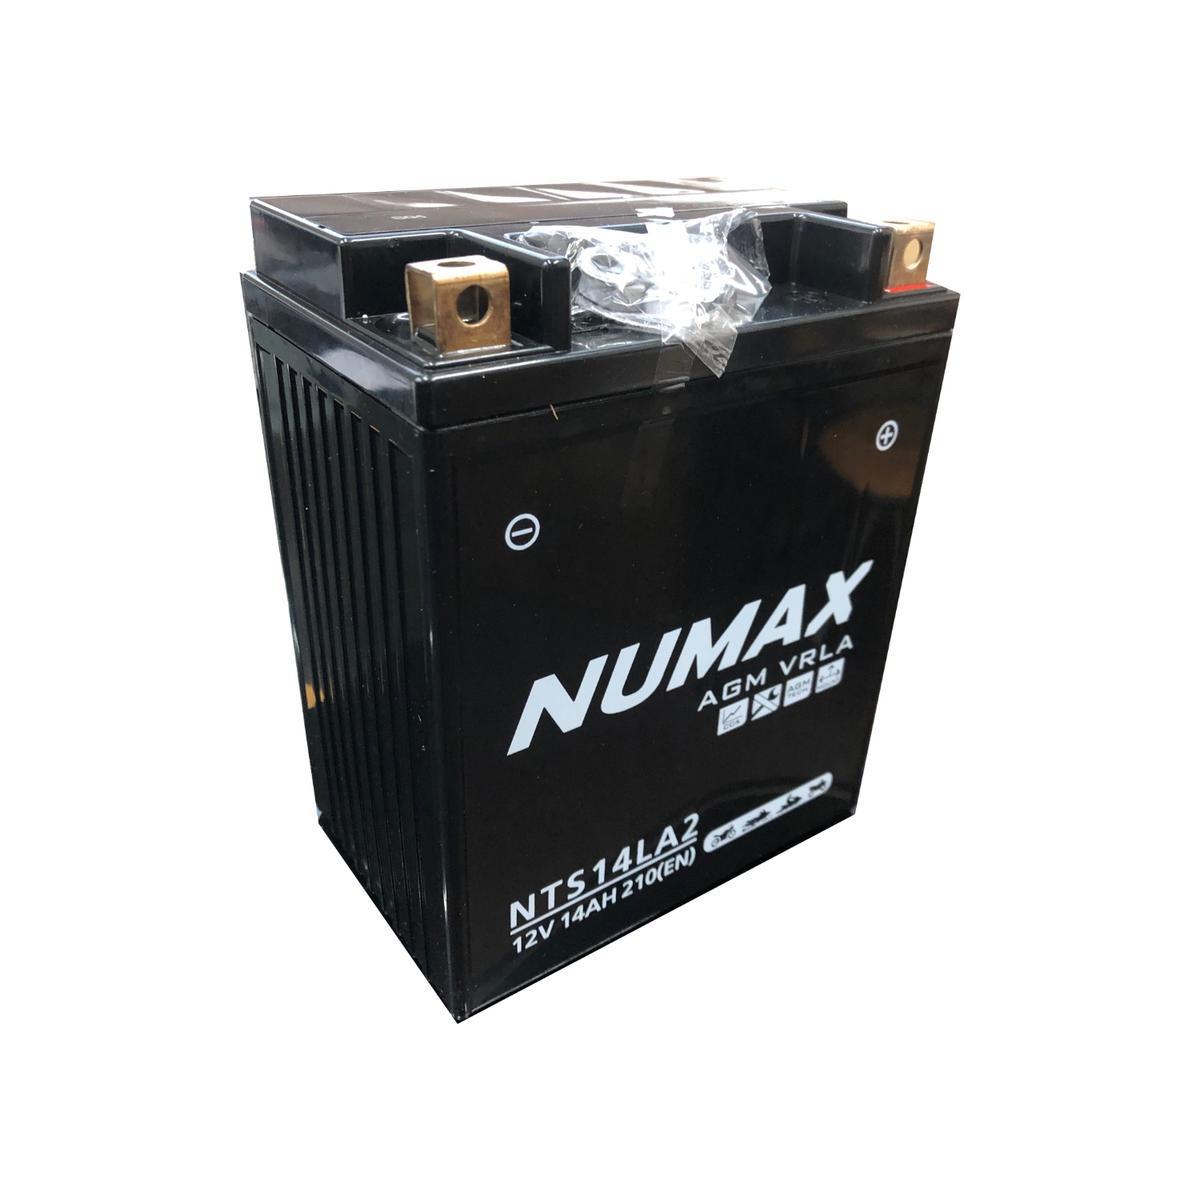 Numax NTS14LA2 MotorBike Motorcycle Battery BETAMOTOR 1000cc YB6 12N14-3A